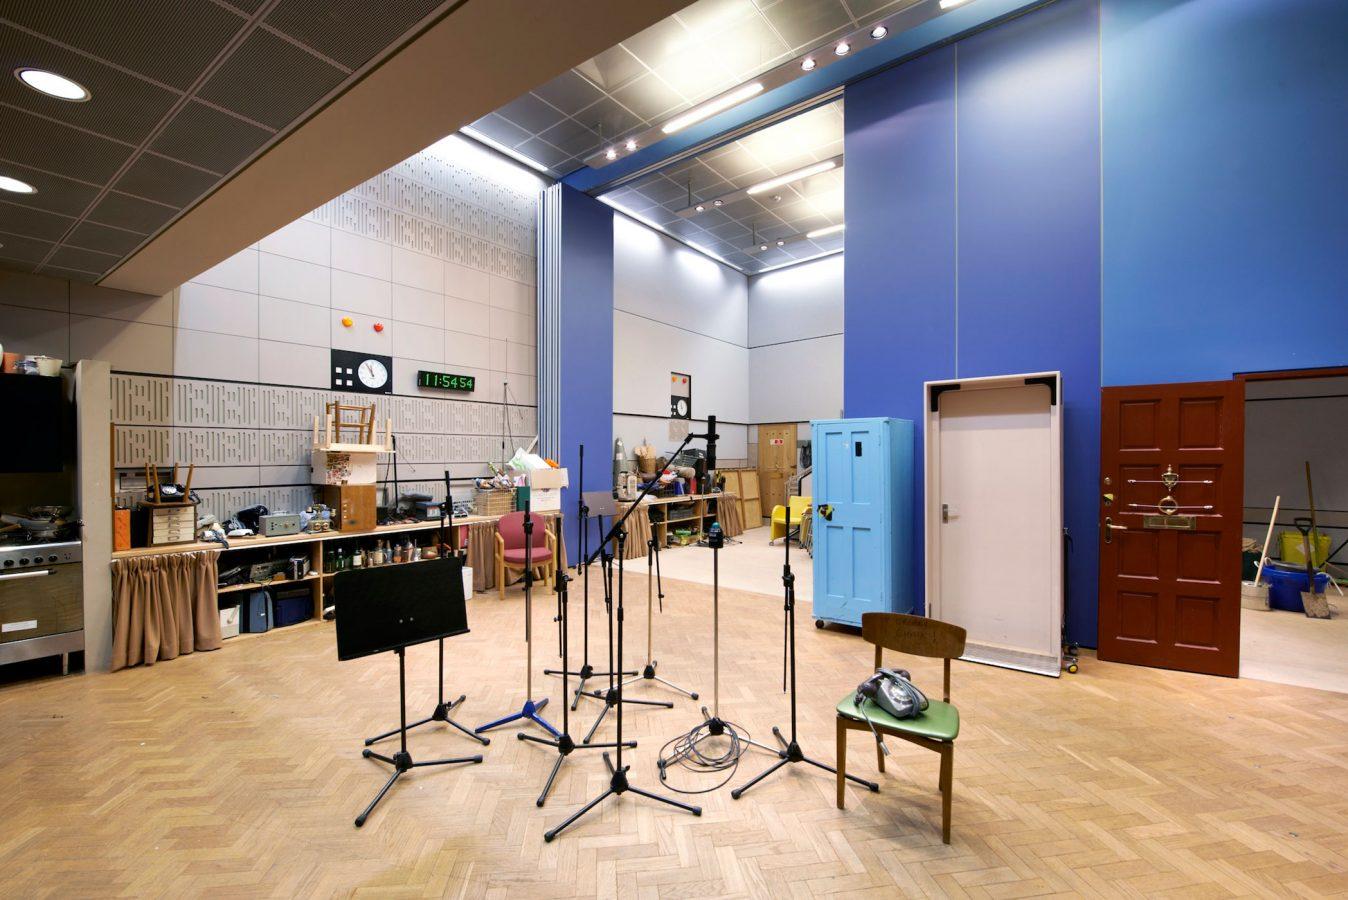 BBC Sound Effects Drama Studio BBC